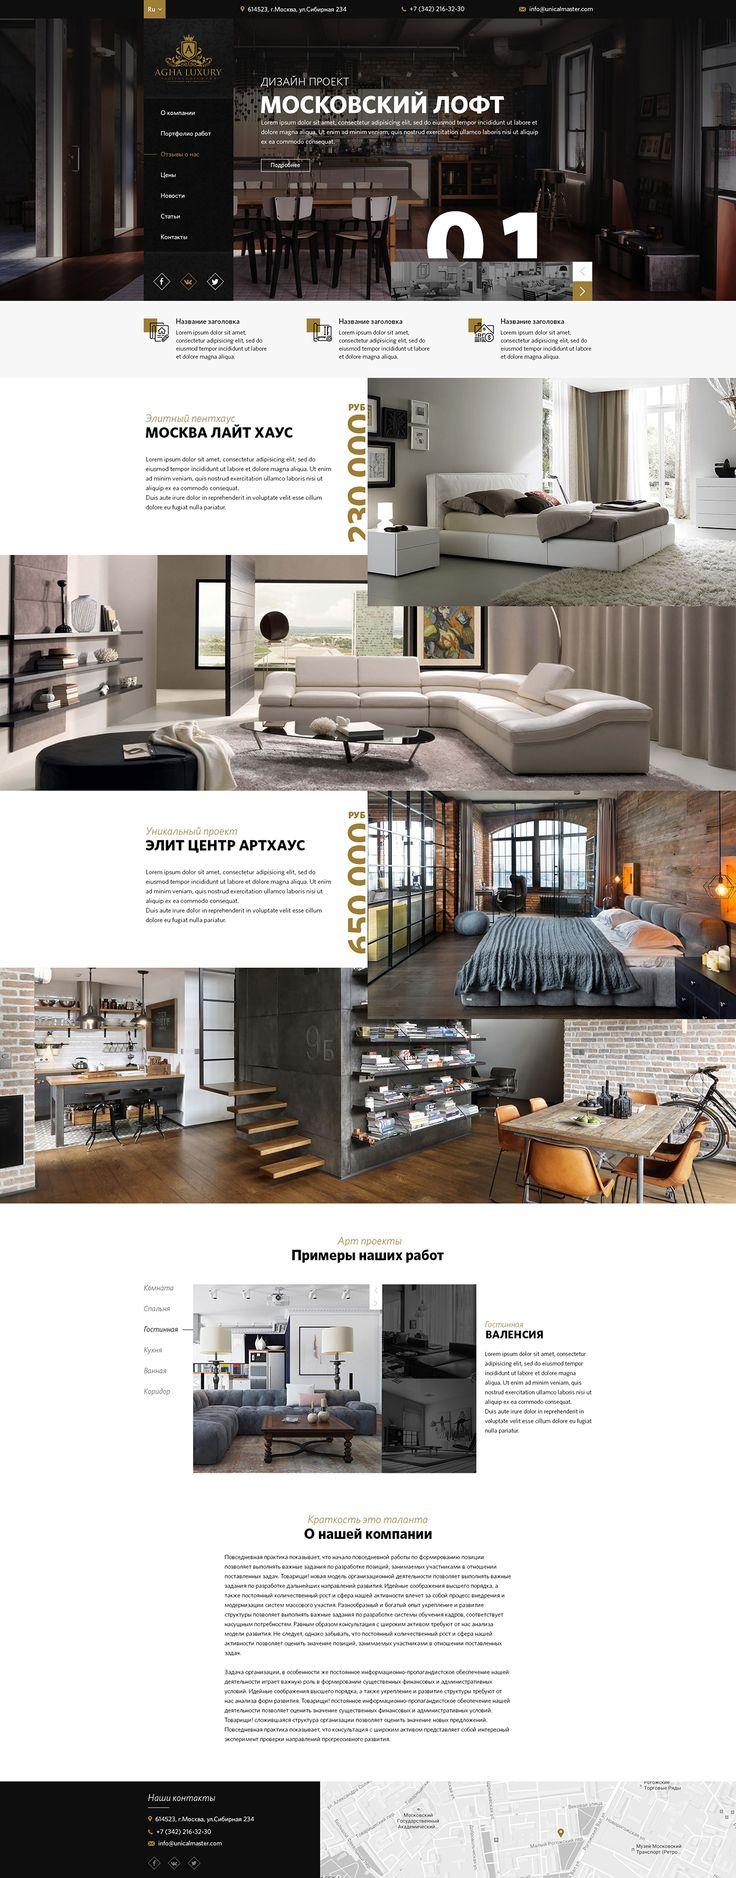 Art decor studio on Behance